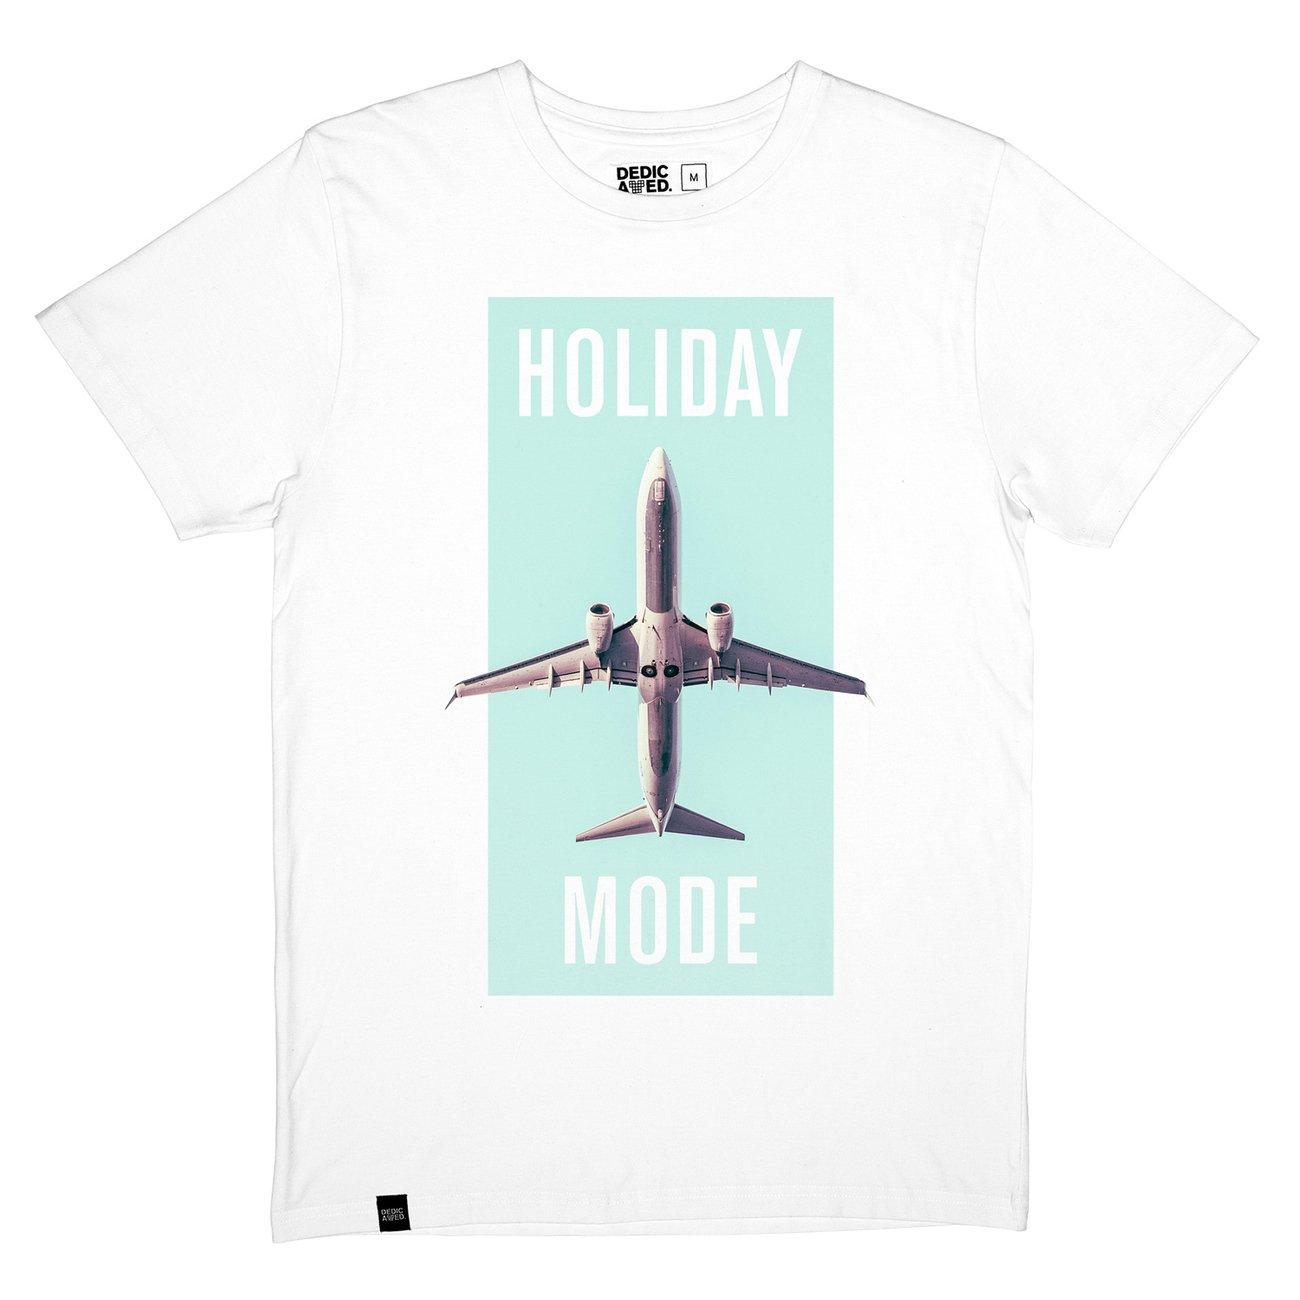 4bdadf36a525f6 DEDICATED - T-shirt Stockholm Holiday Mode - Tshirt Store Online